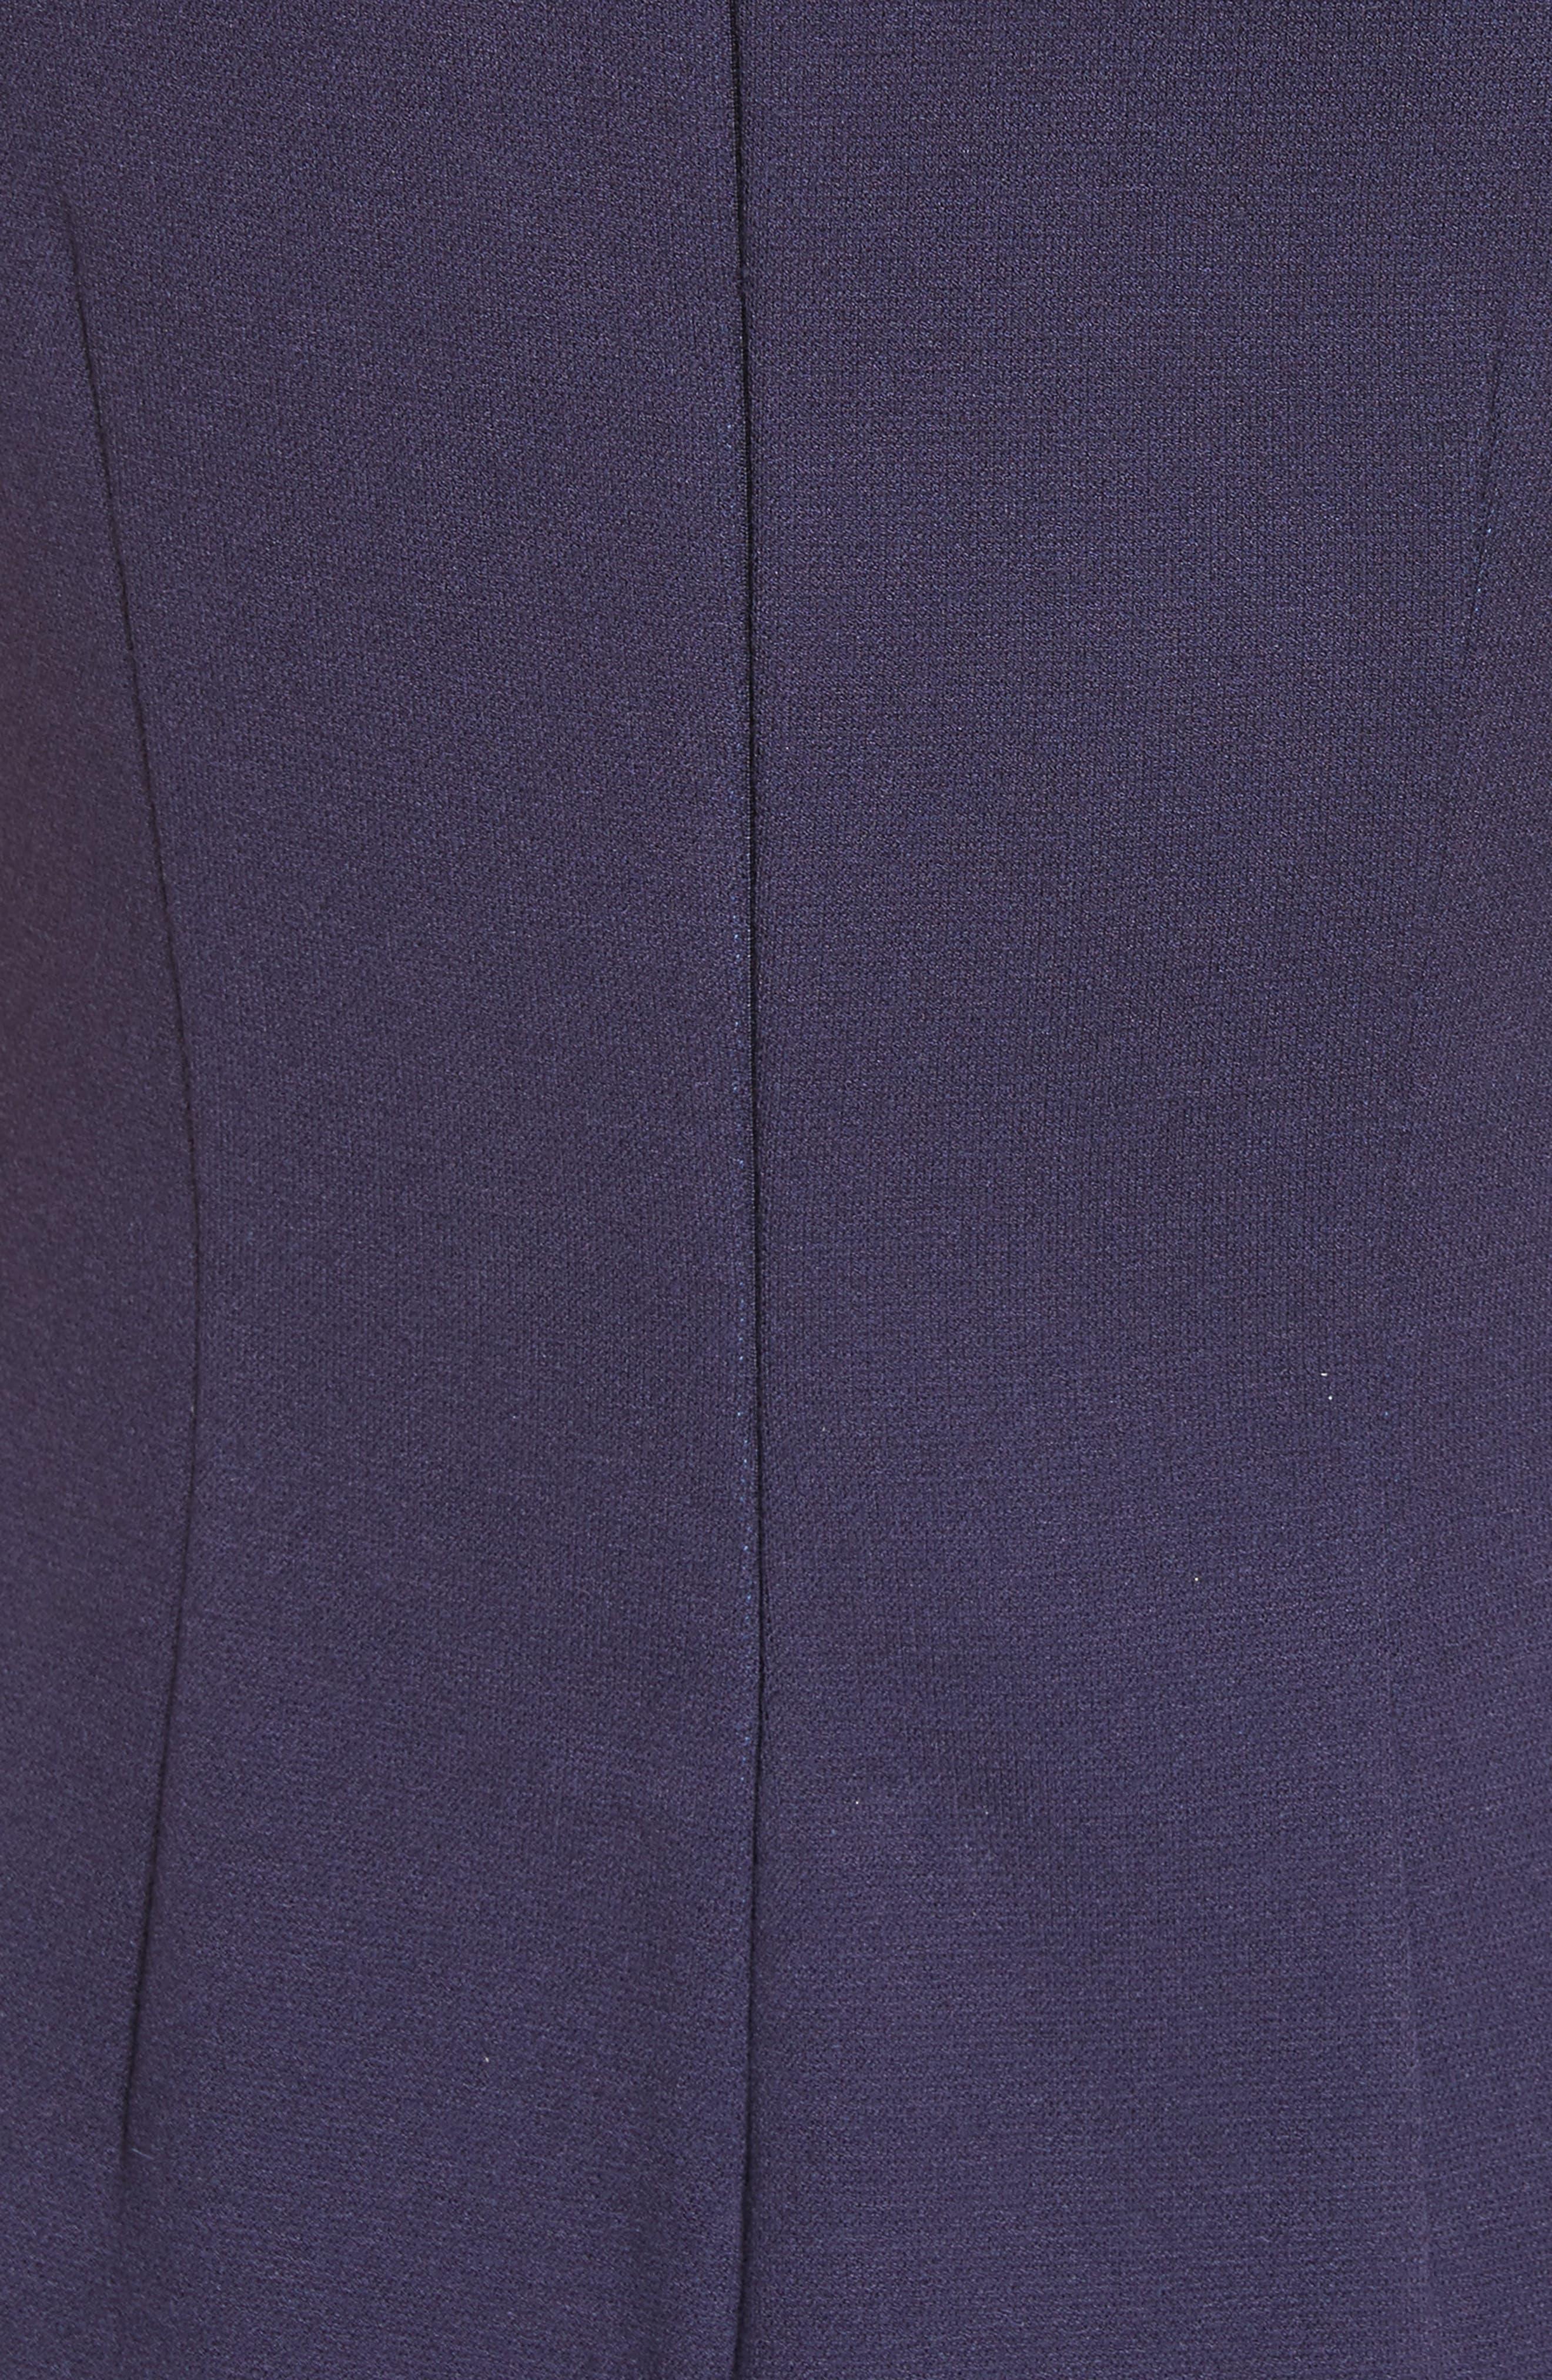 Colorblock Milano Knit Dress,                             Alternate thumbnail 5, color,                             Navy Multi